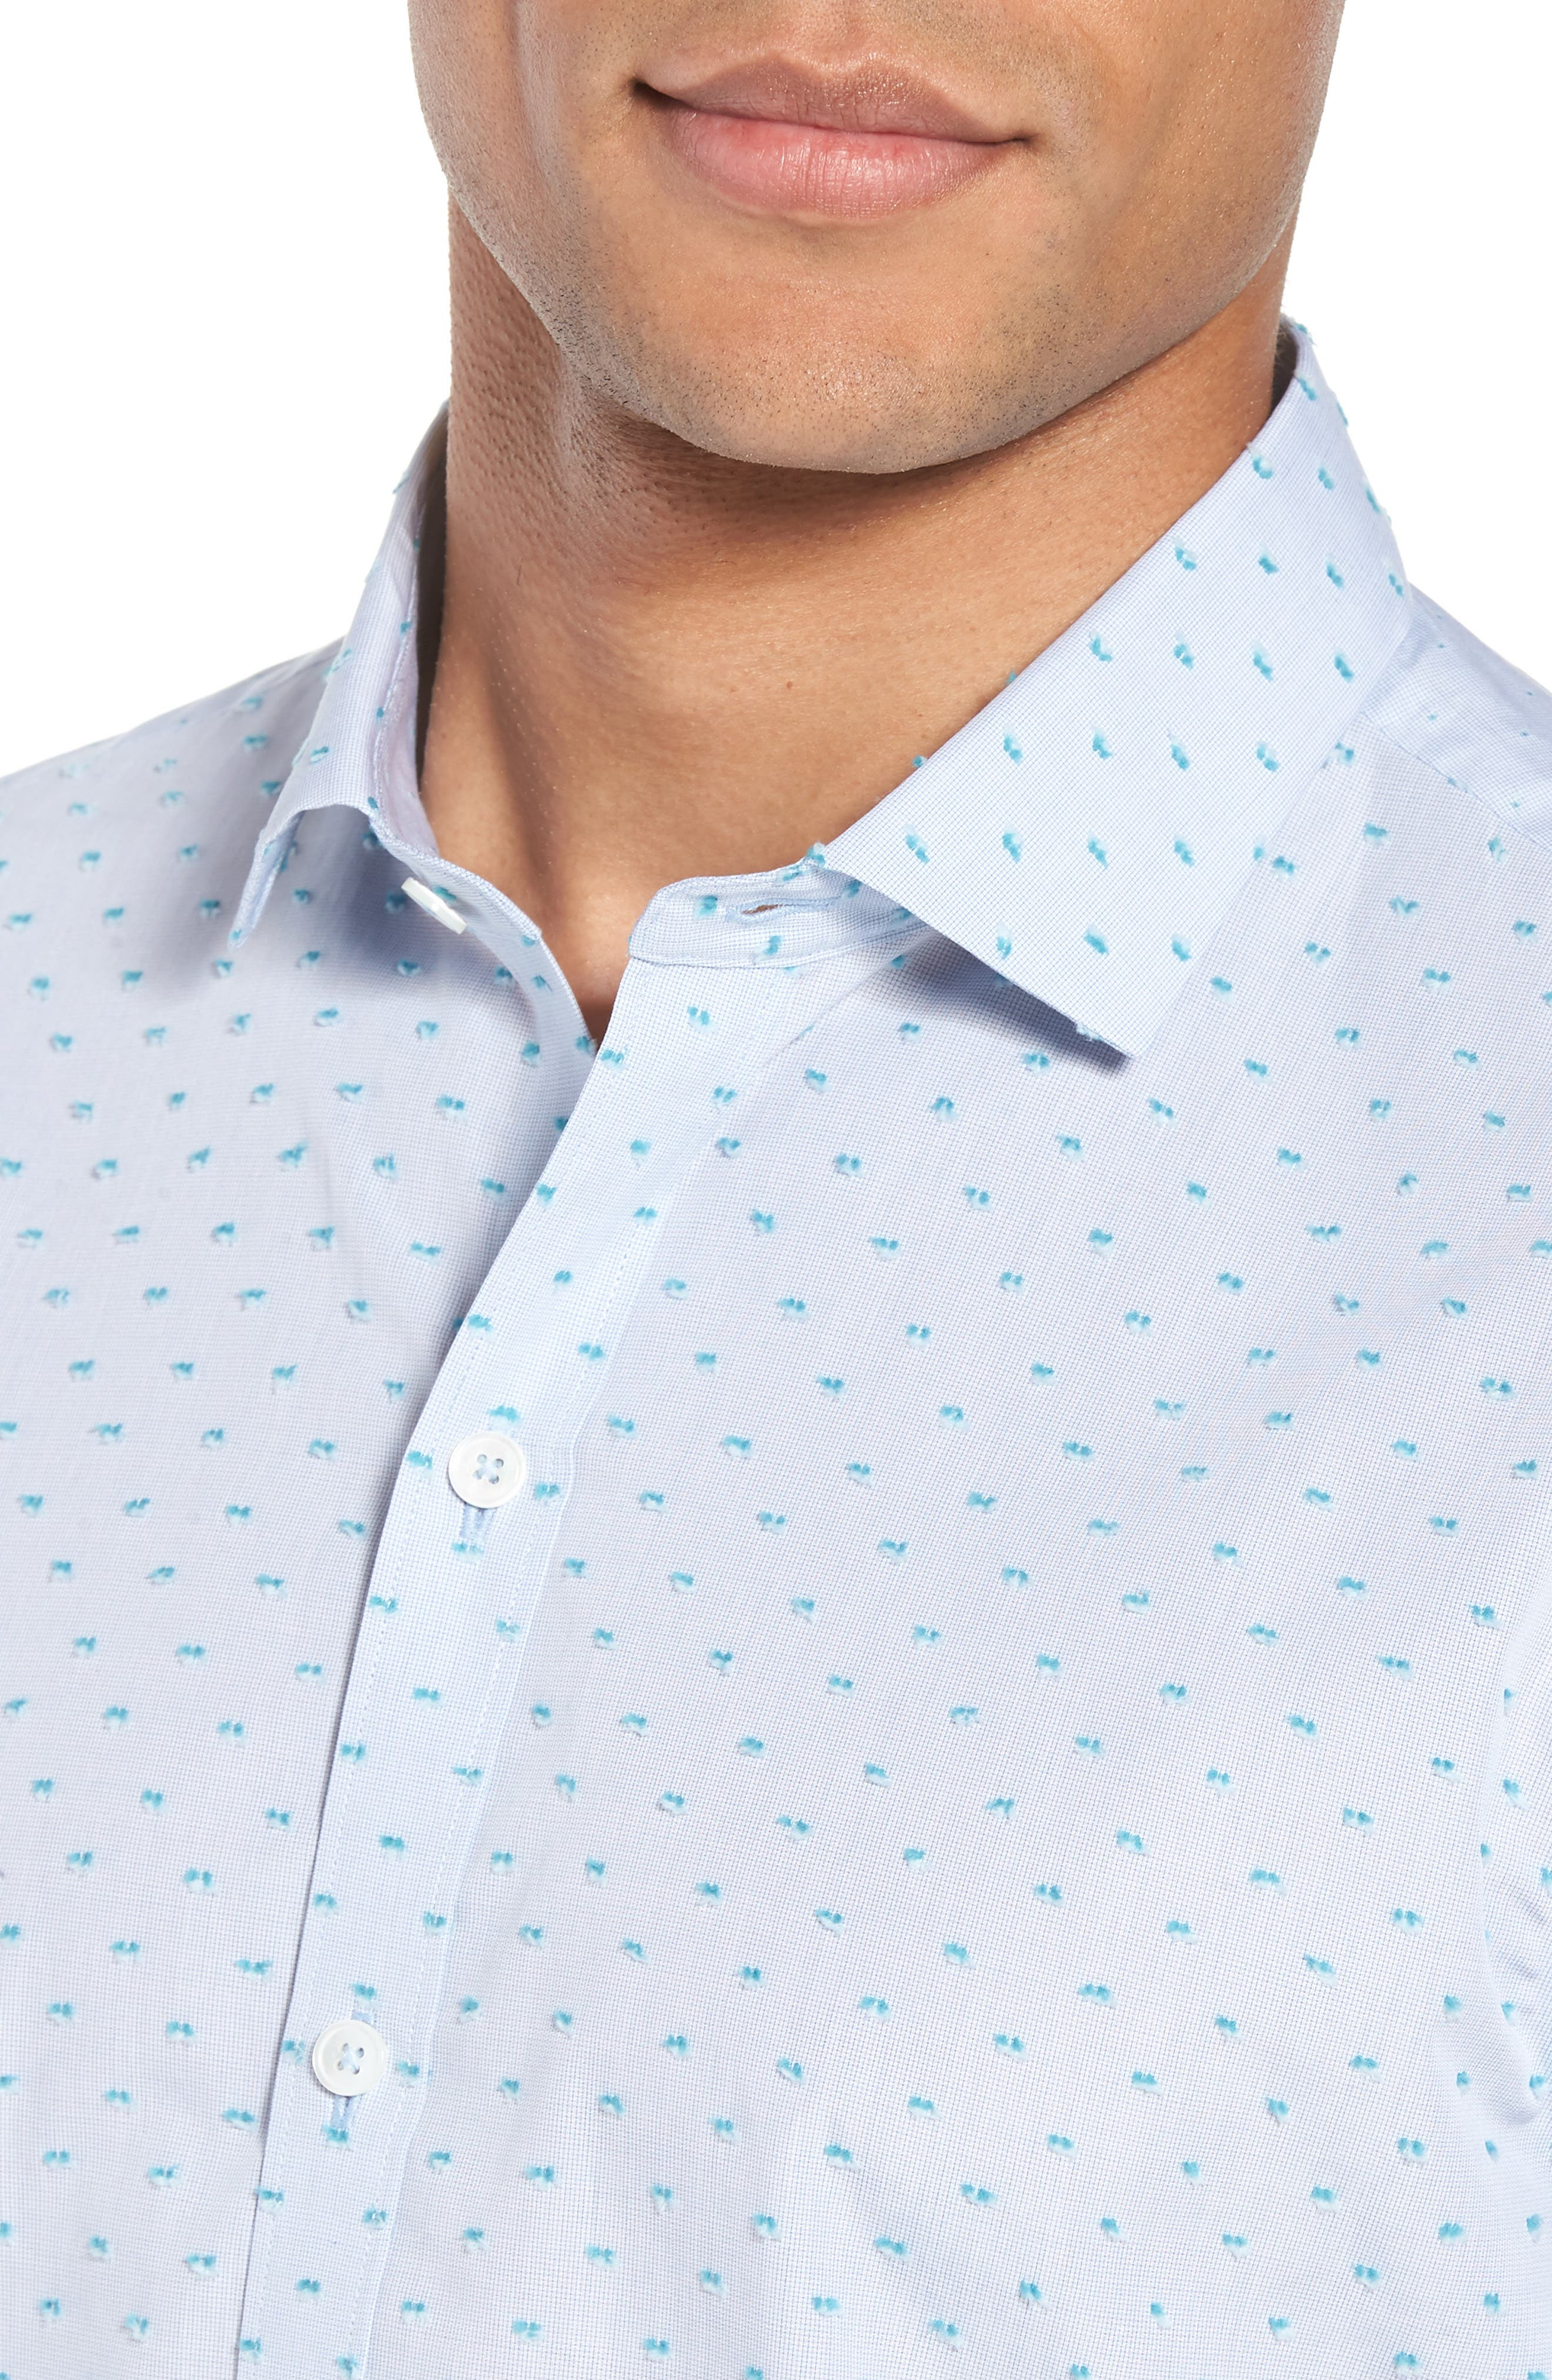 Dolle Fil a Coupe Sport Shirt,                             Alternate thumbnail 4, color,                             Light Blue